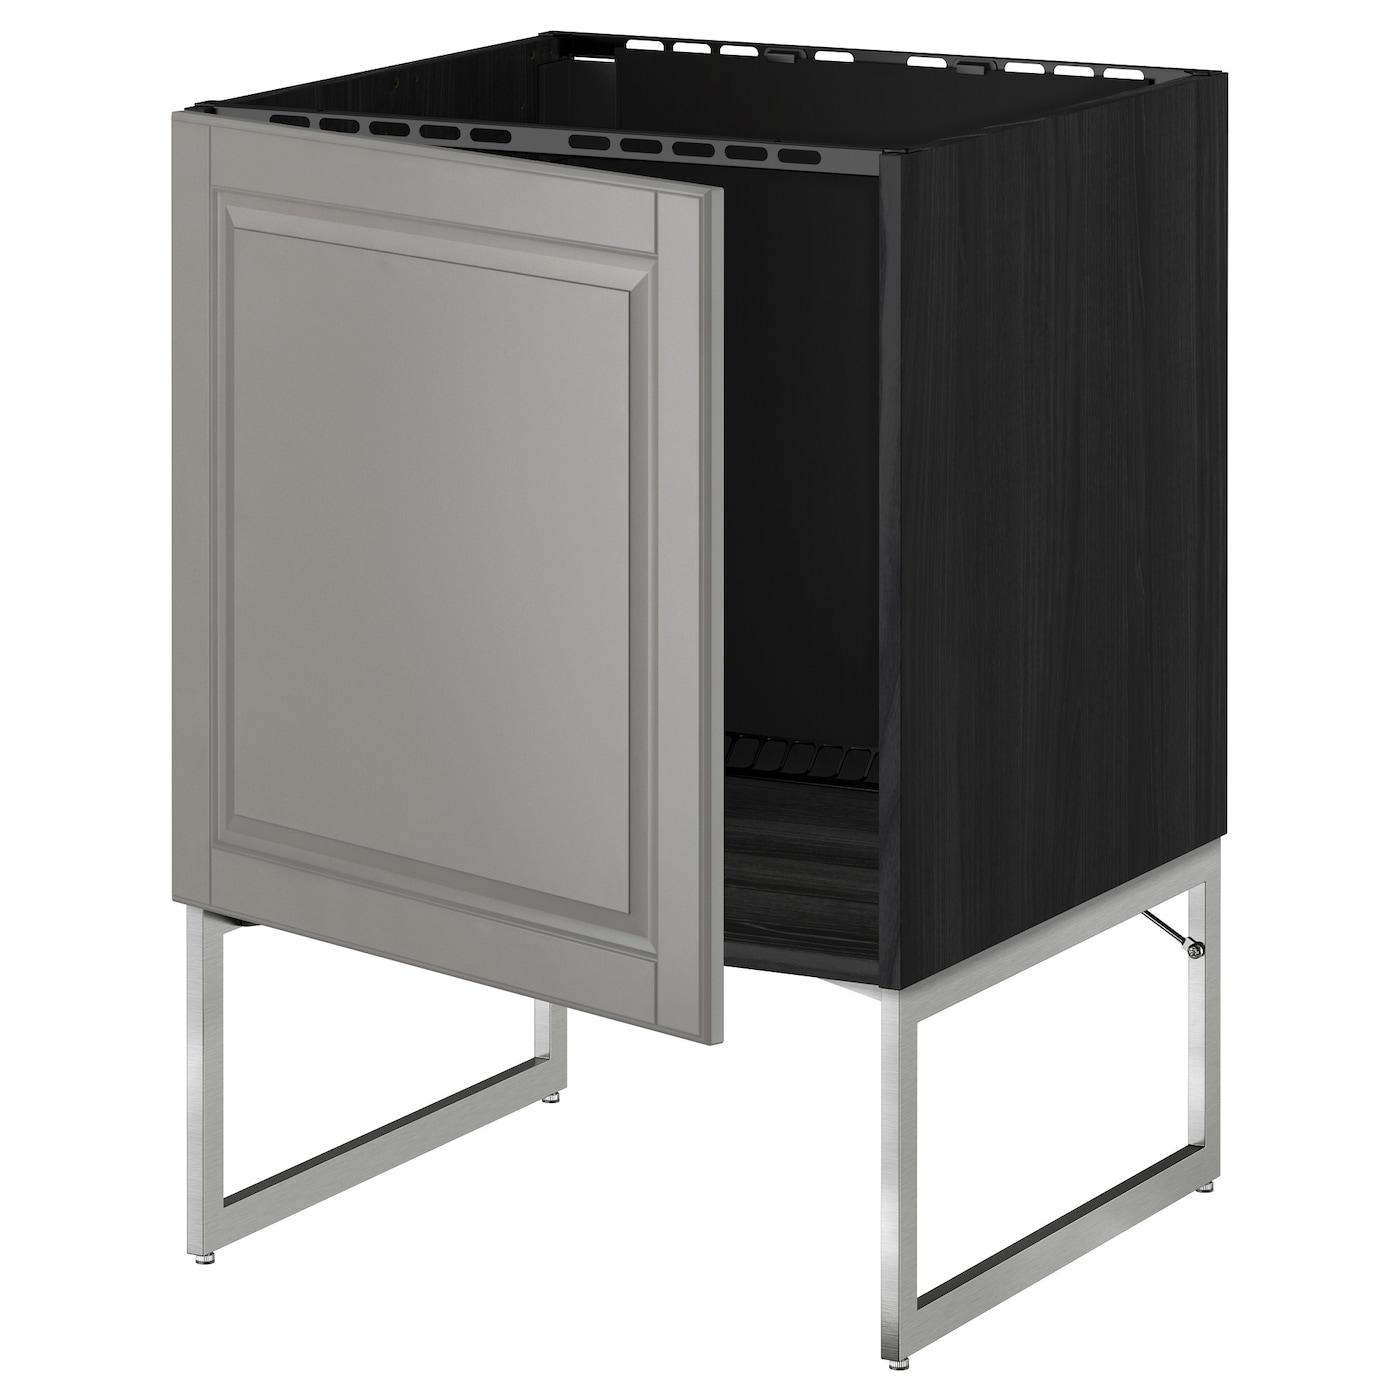 Metod base cabinet for sink black bodbyn grey 60x60x60 cm for Black kitchen base cabinets